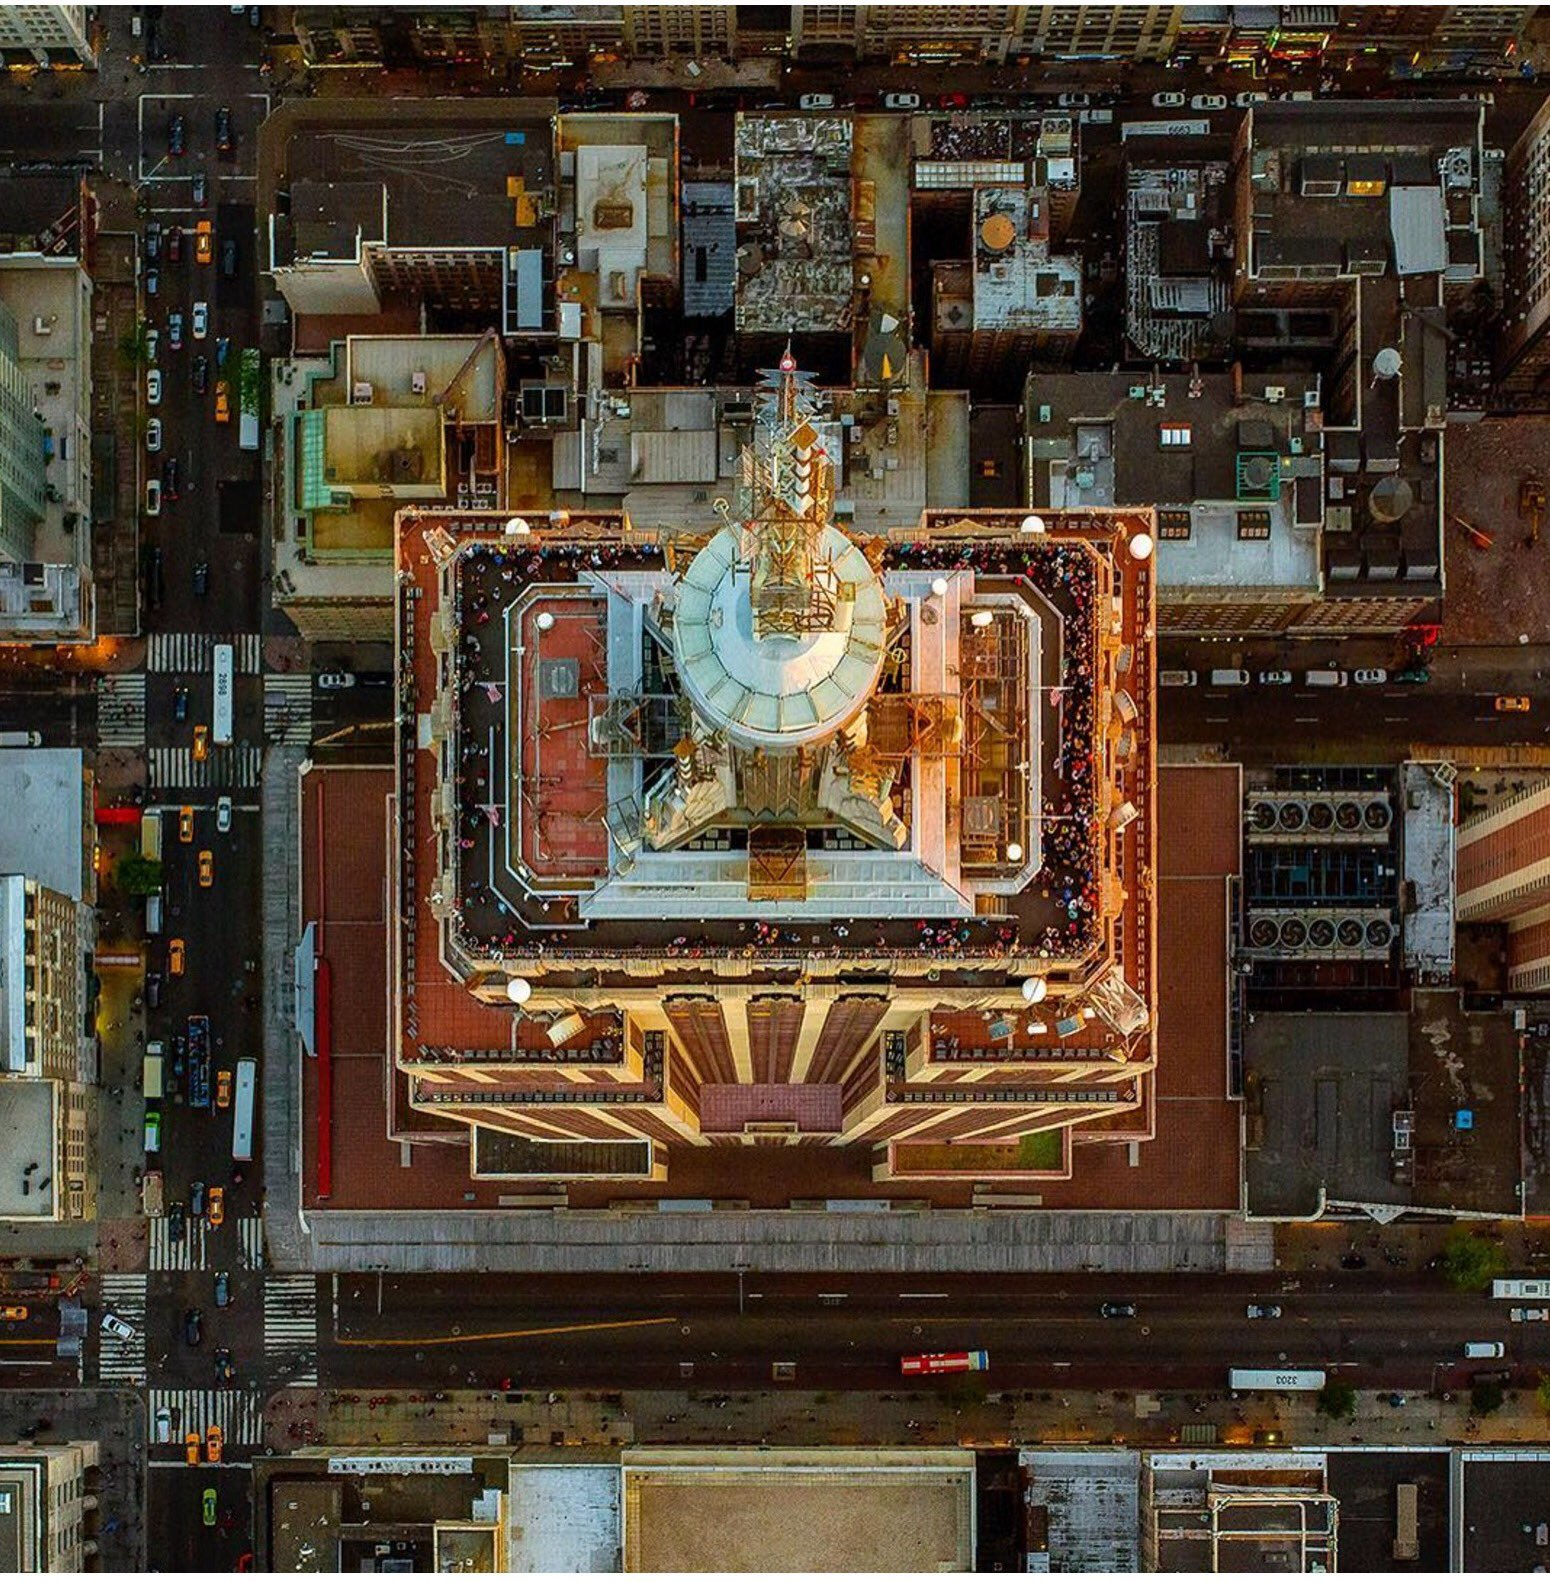 RT @ThamKhaiMeng: Bird's eye view of Empire State Building. Thanks @MilsteinJeff https://t.co/EF9BSkLMar https://t.co/F8yND55Guy